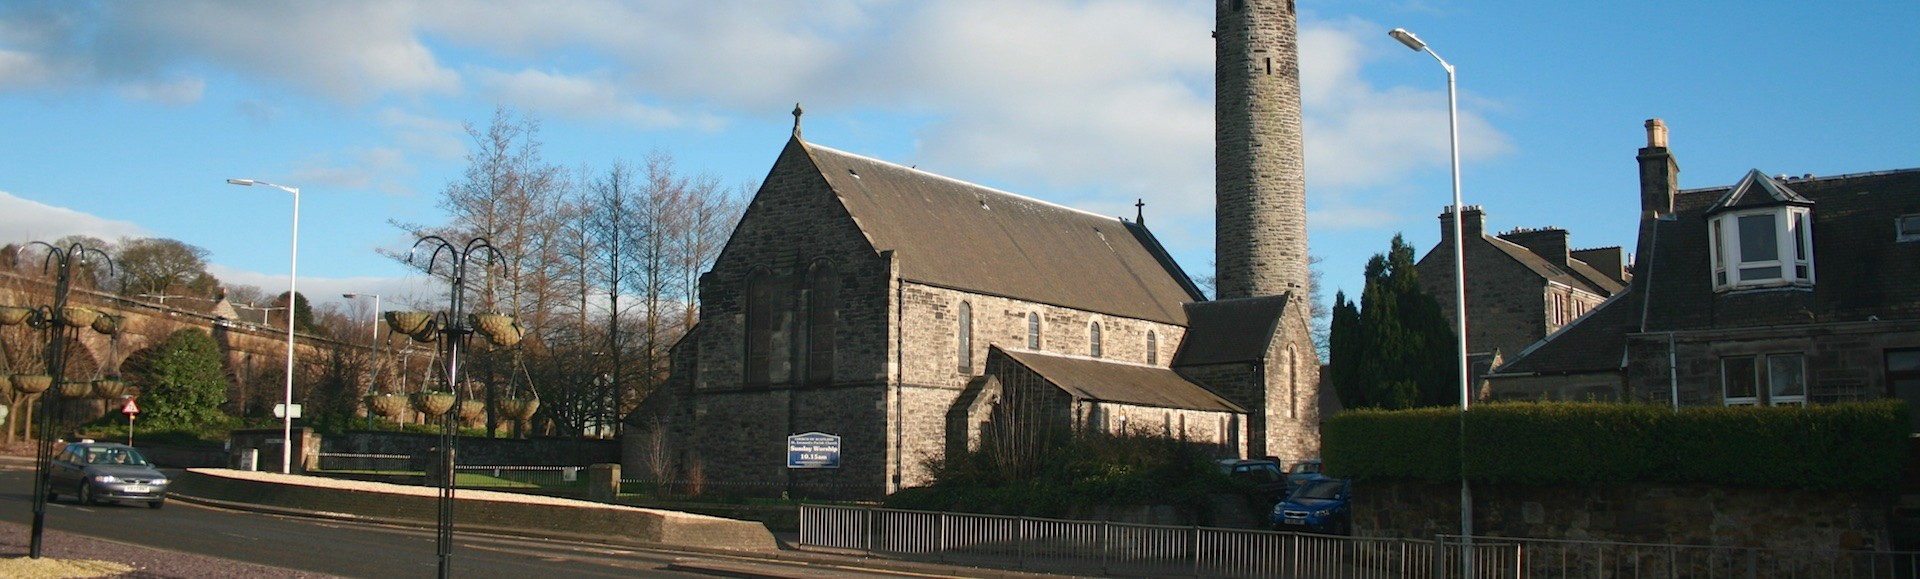 Dunfermline : St Leonard's